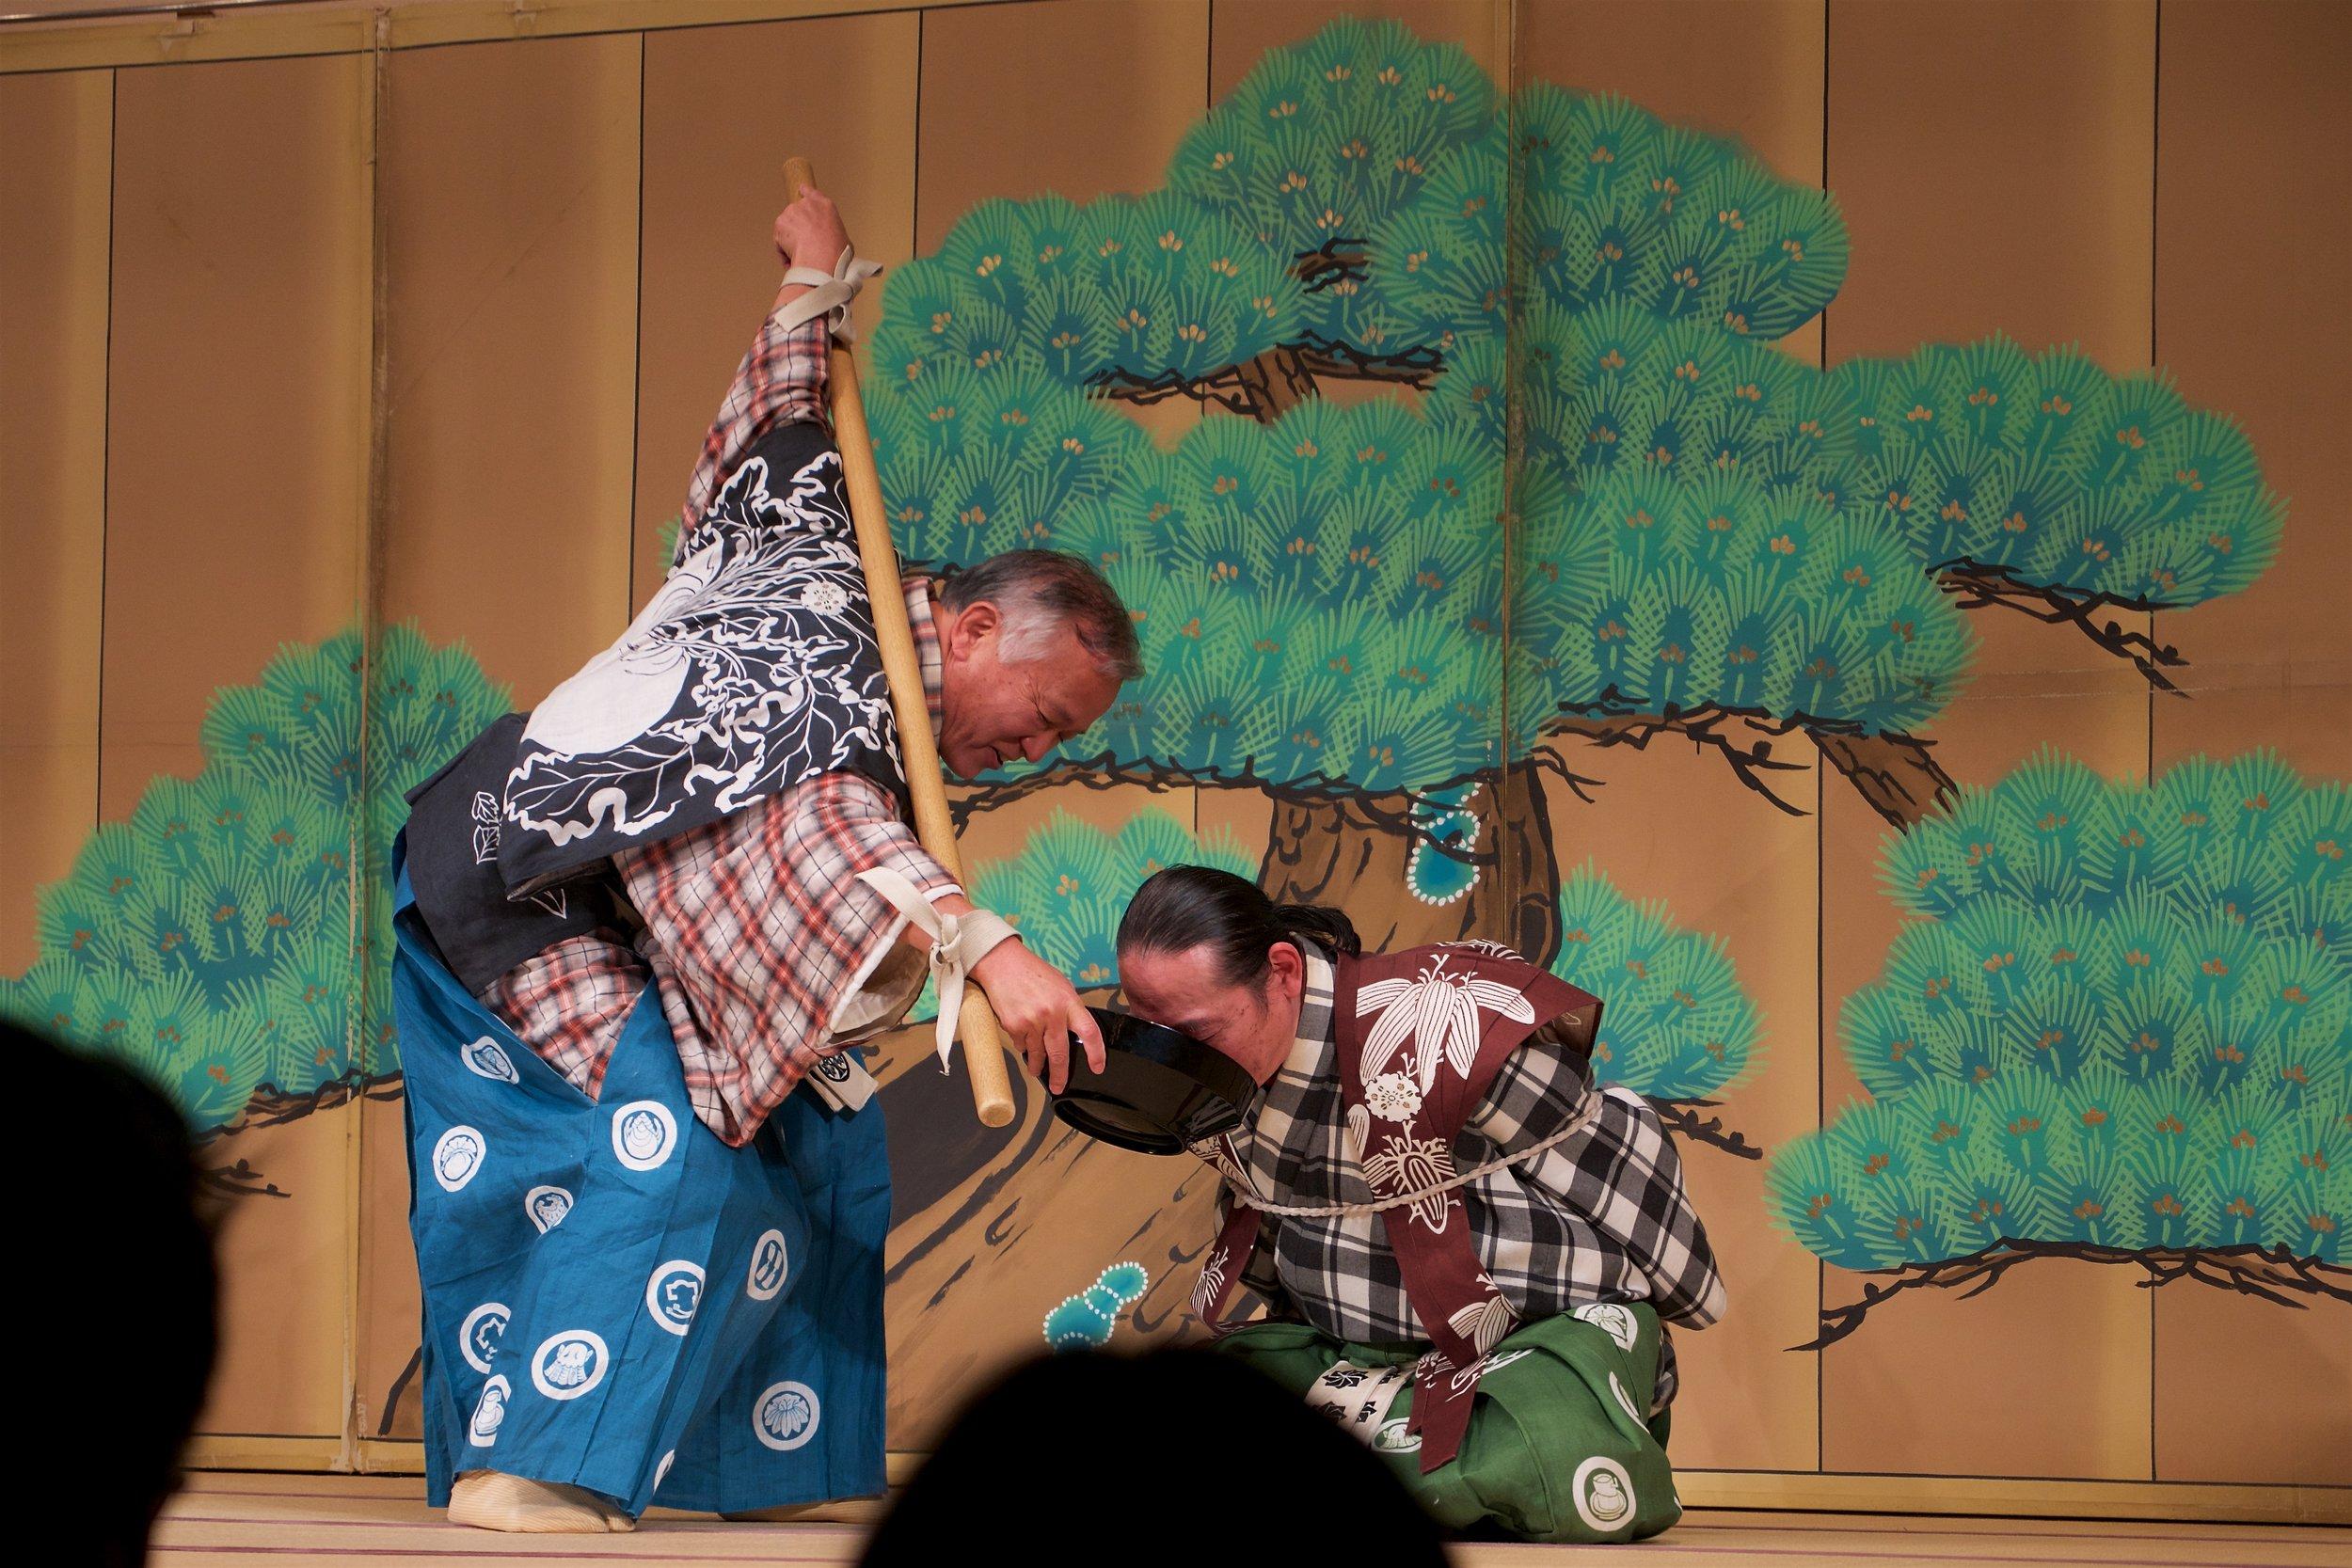 Servants drinking sake in the Kyogen play